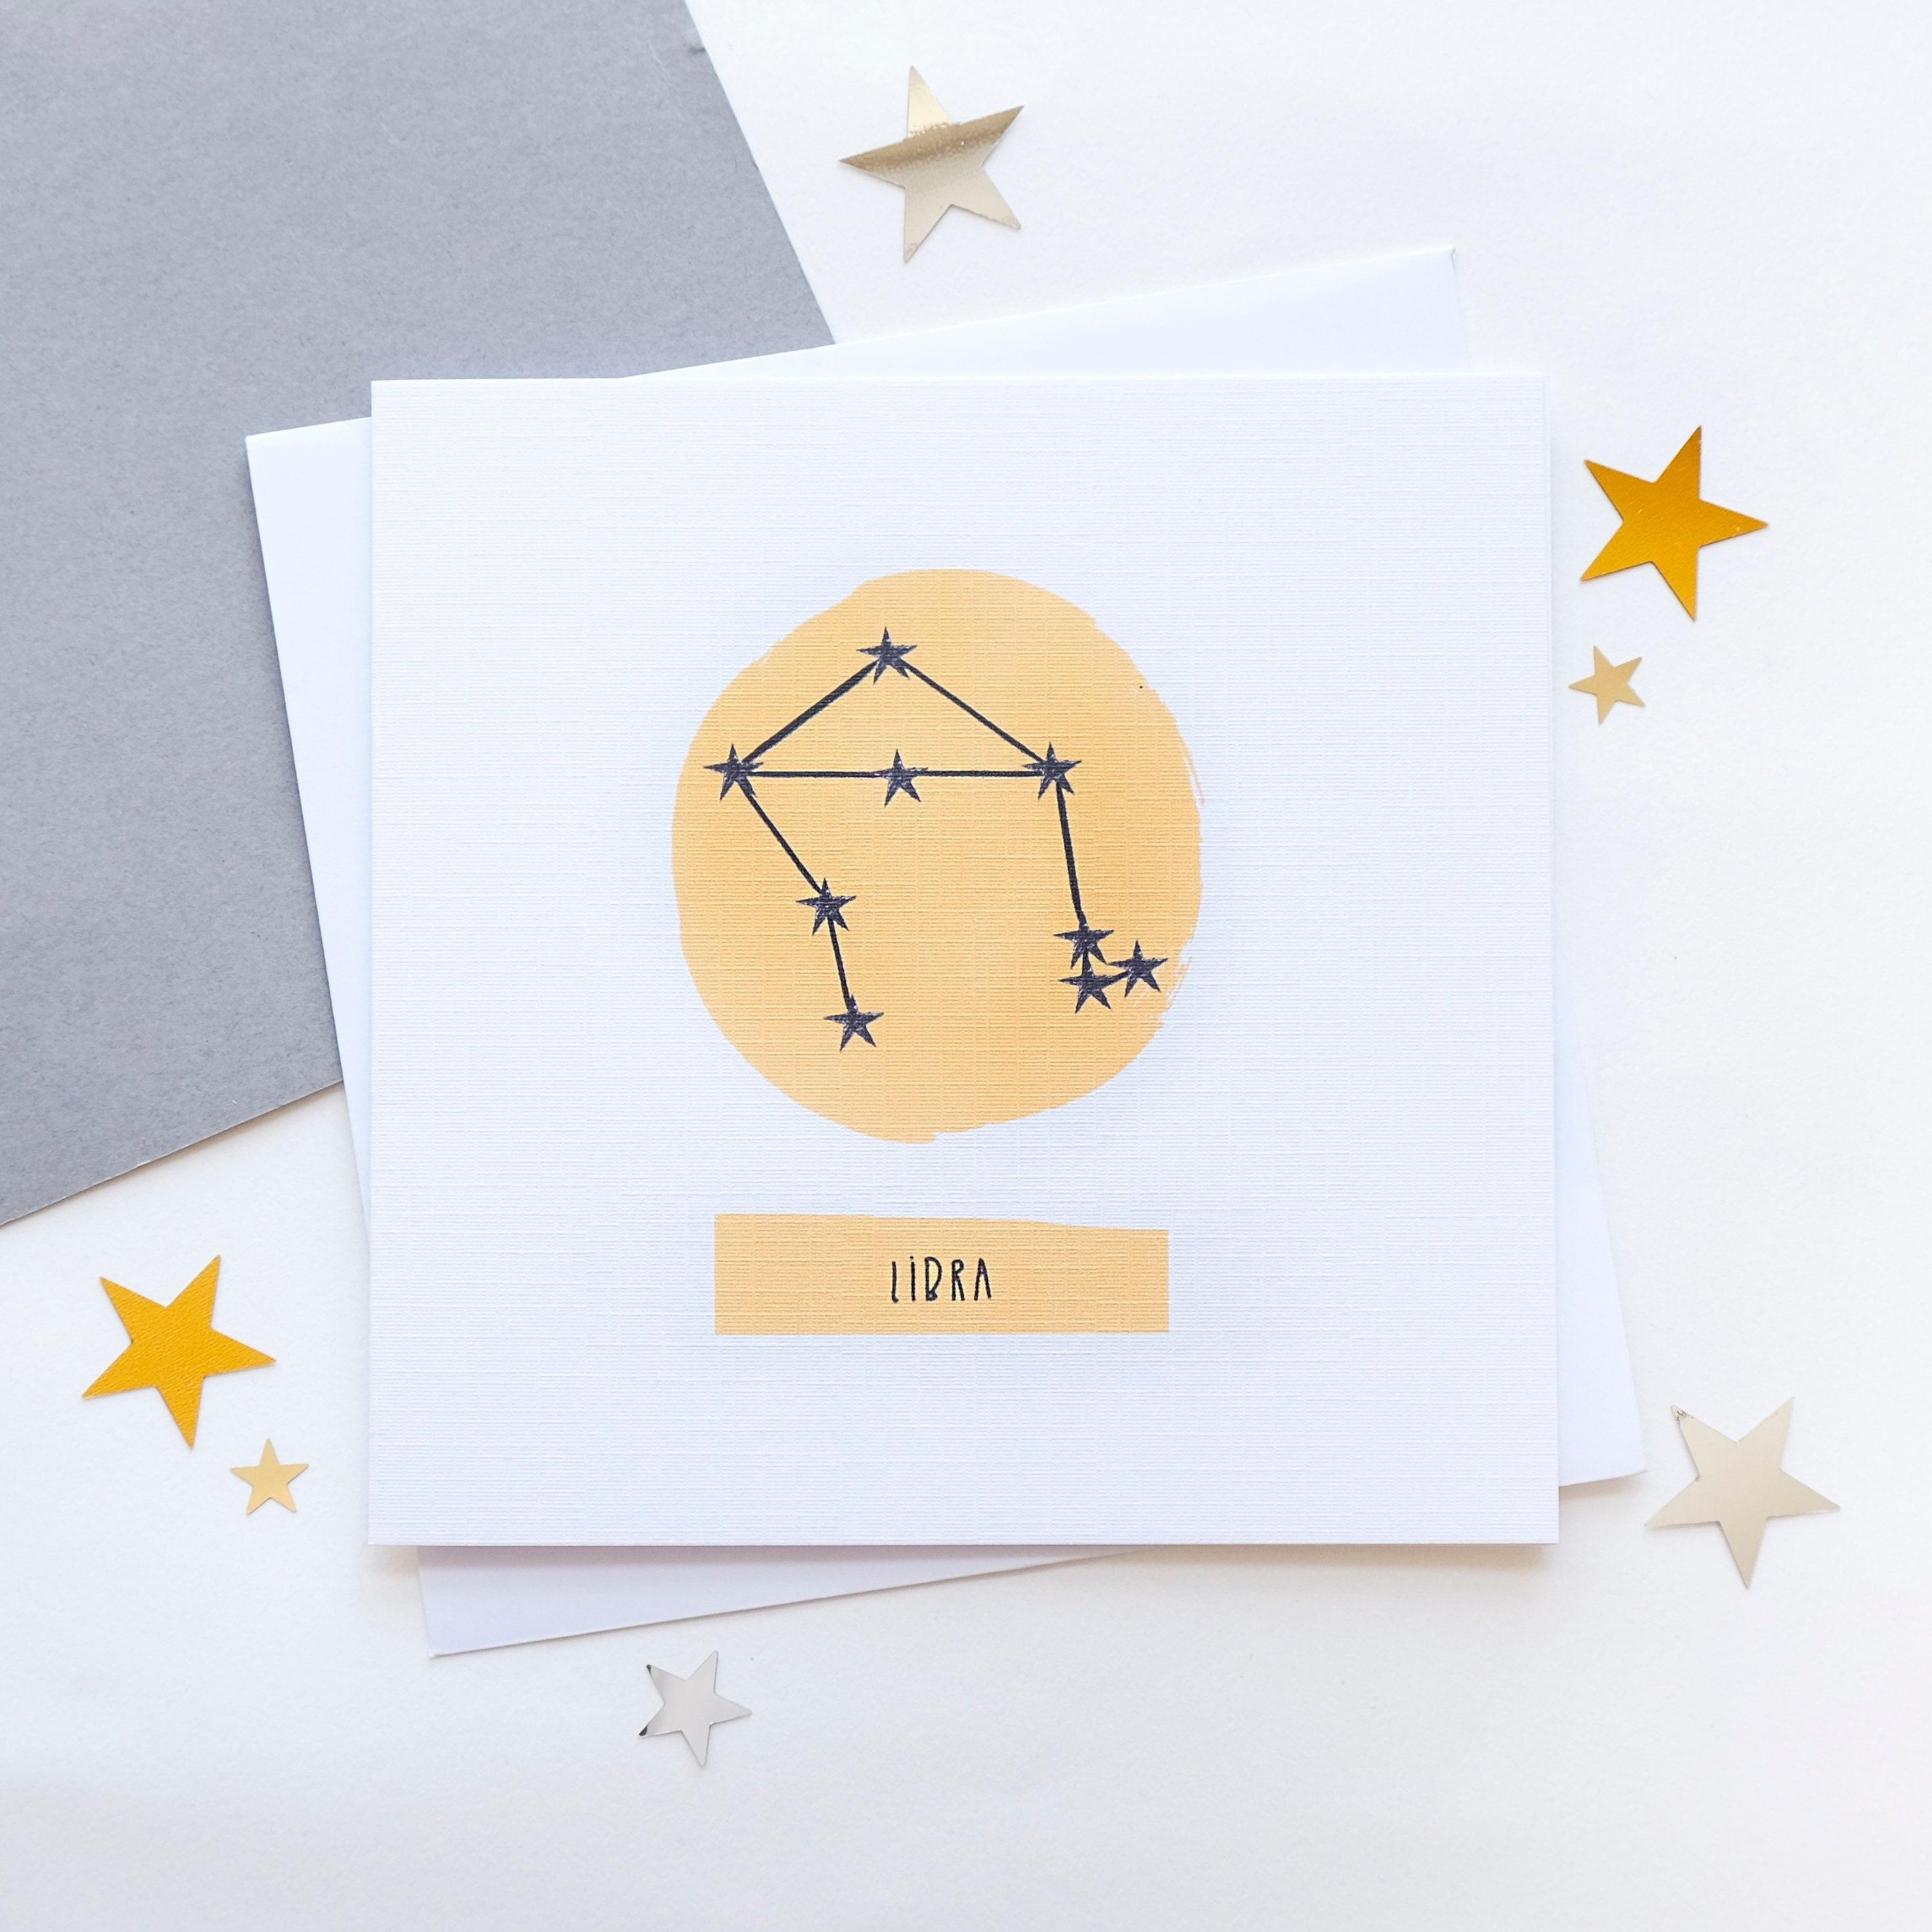 Libra Star Sign Zodiac Birthday Card September Birthday October